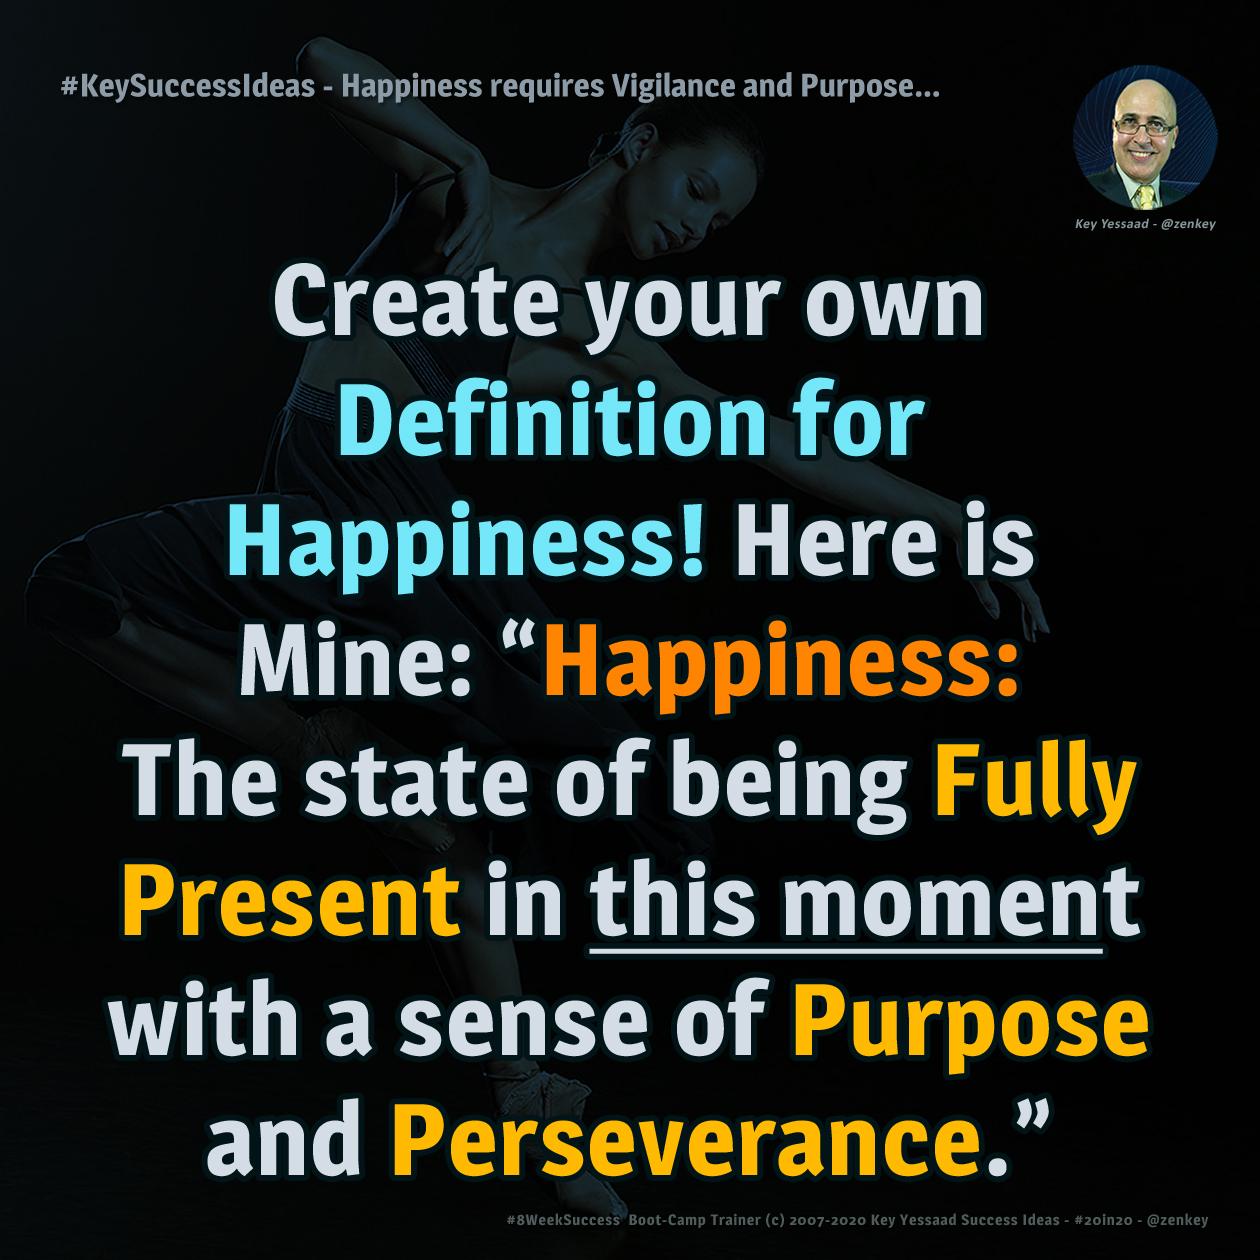 Happiness requires Vigilance and Purpose... - #KeySuccessIdeas